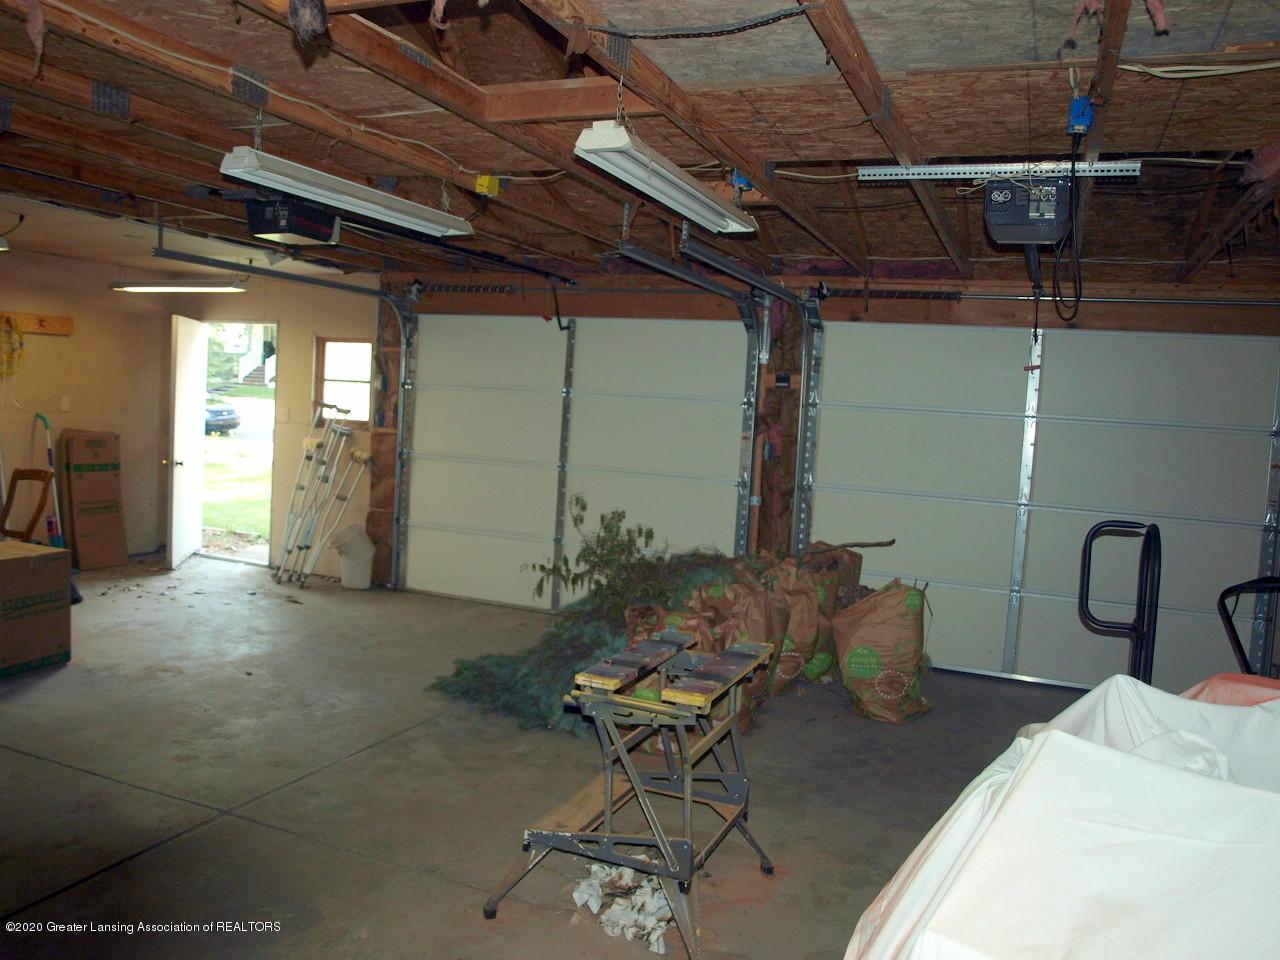 300 S Swegles St - garage - 29